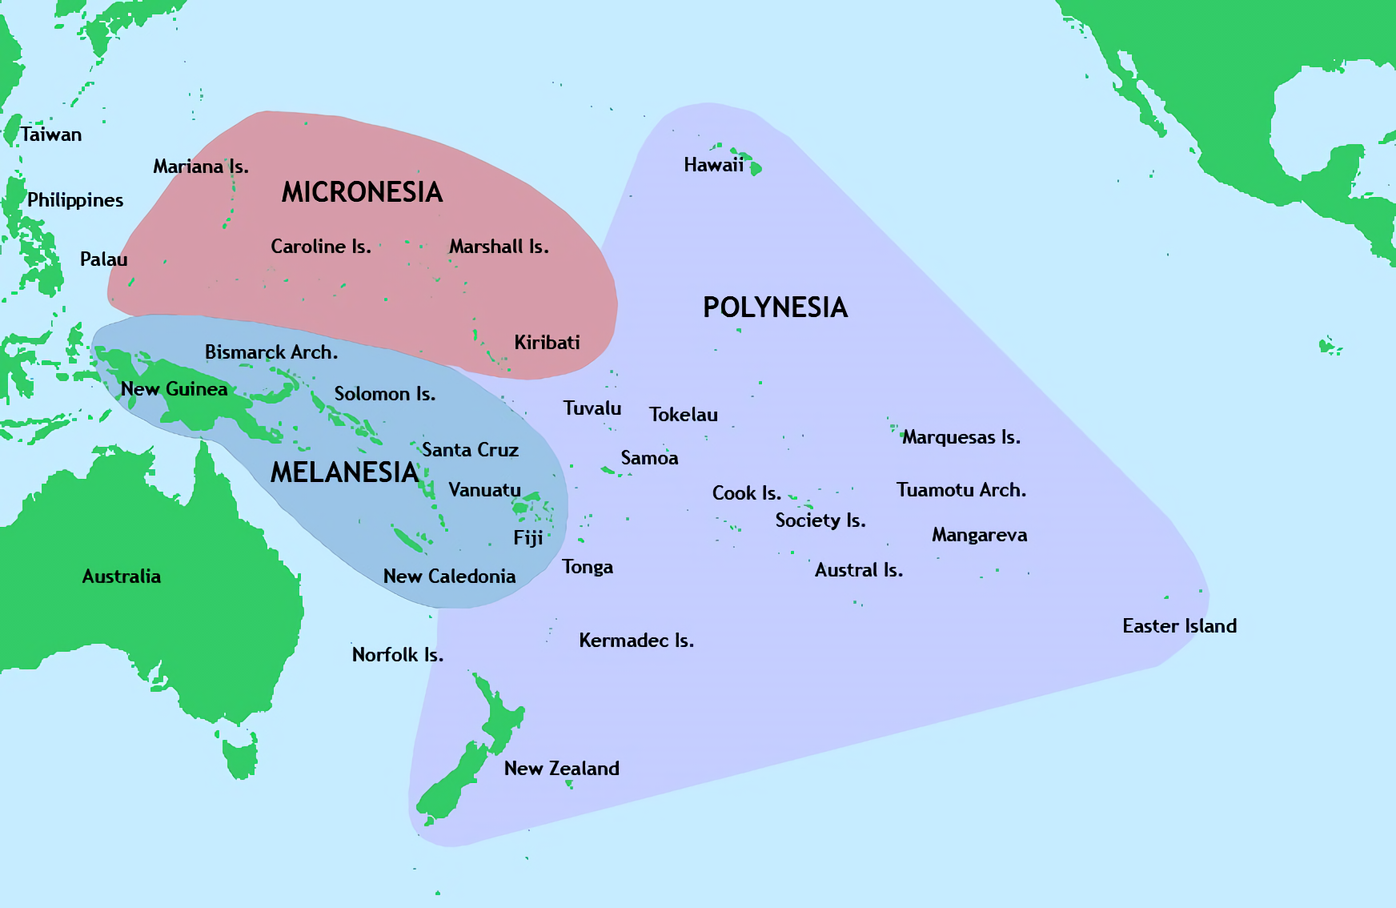 hethreemajorculturalareasintheacificceanelanesia,icronesia,andolynesia